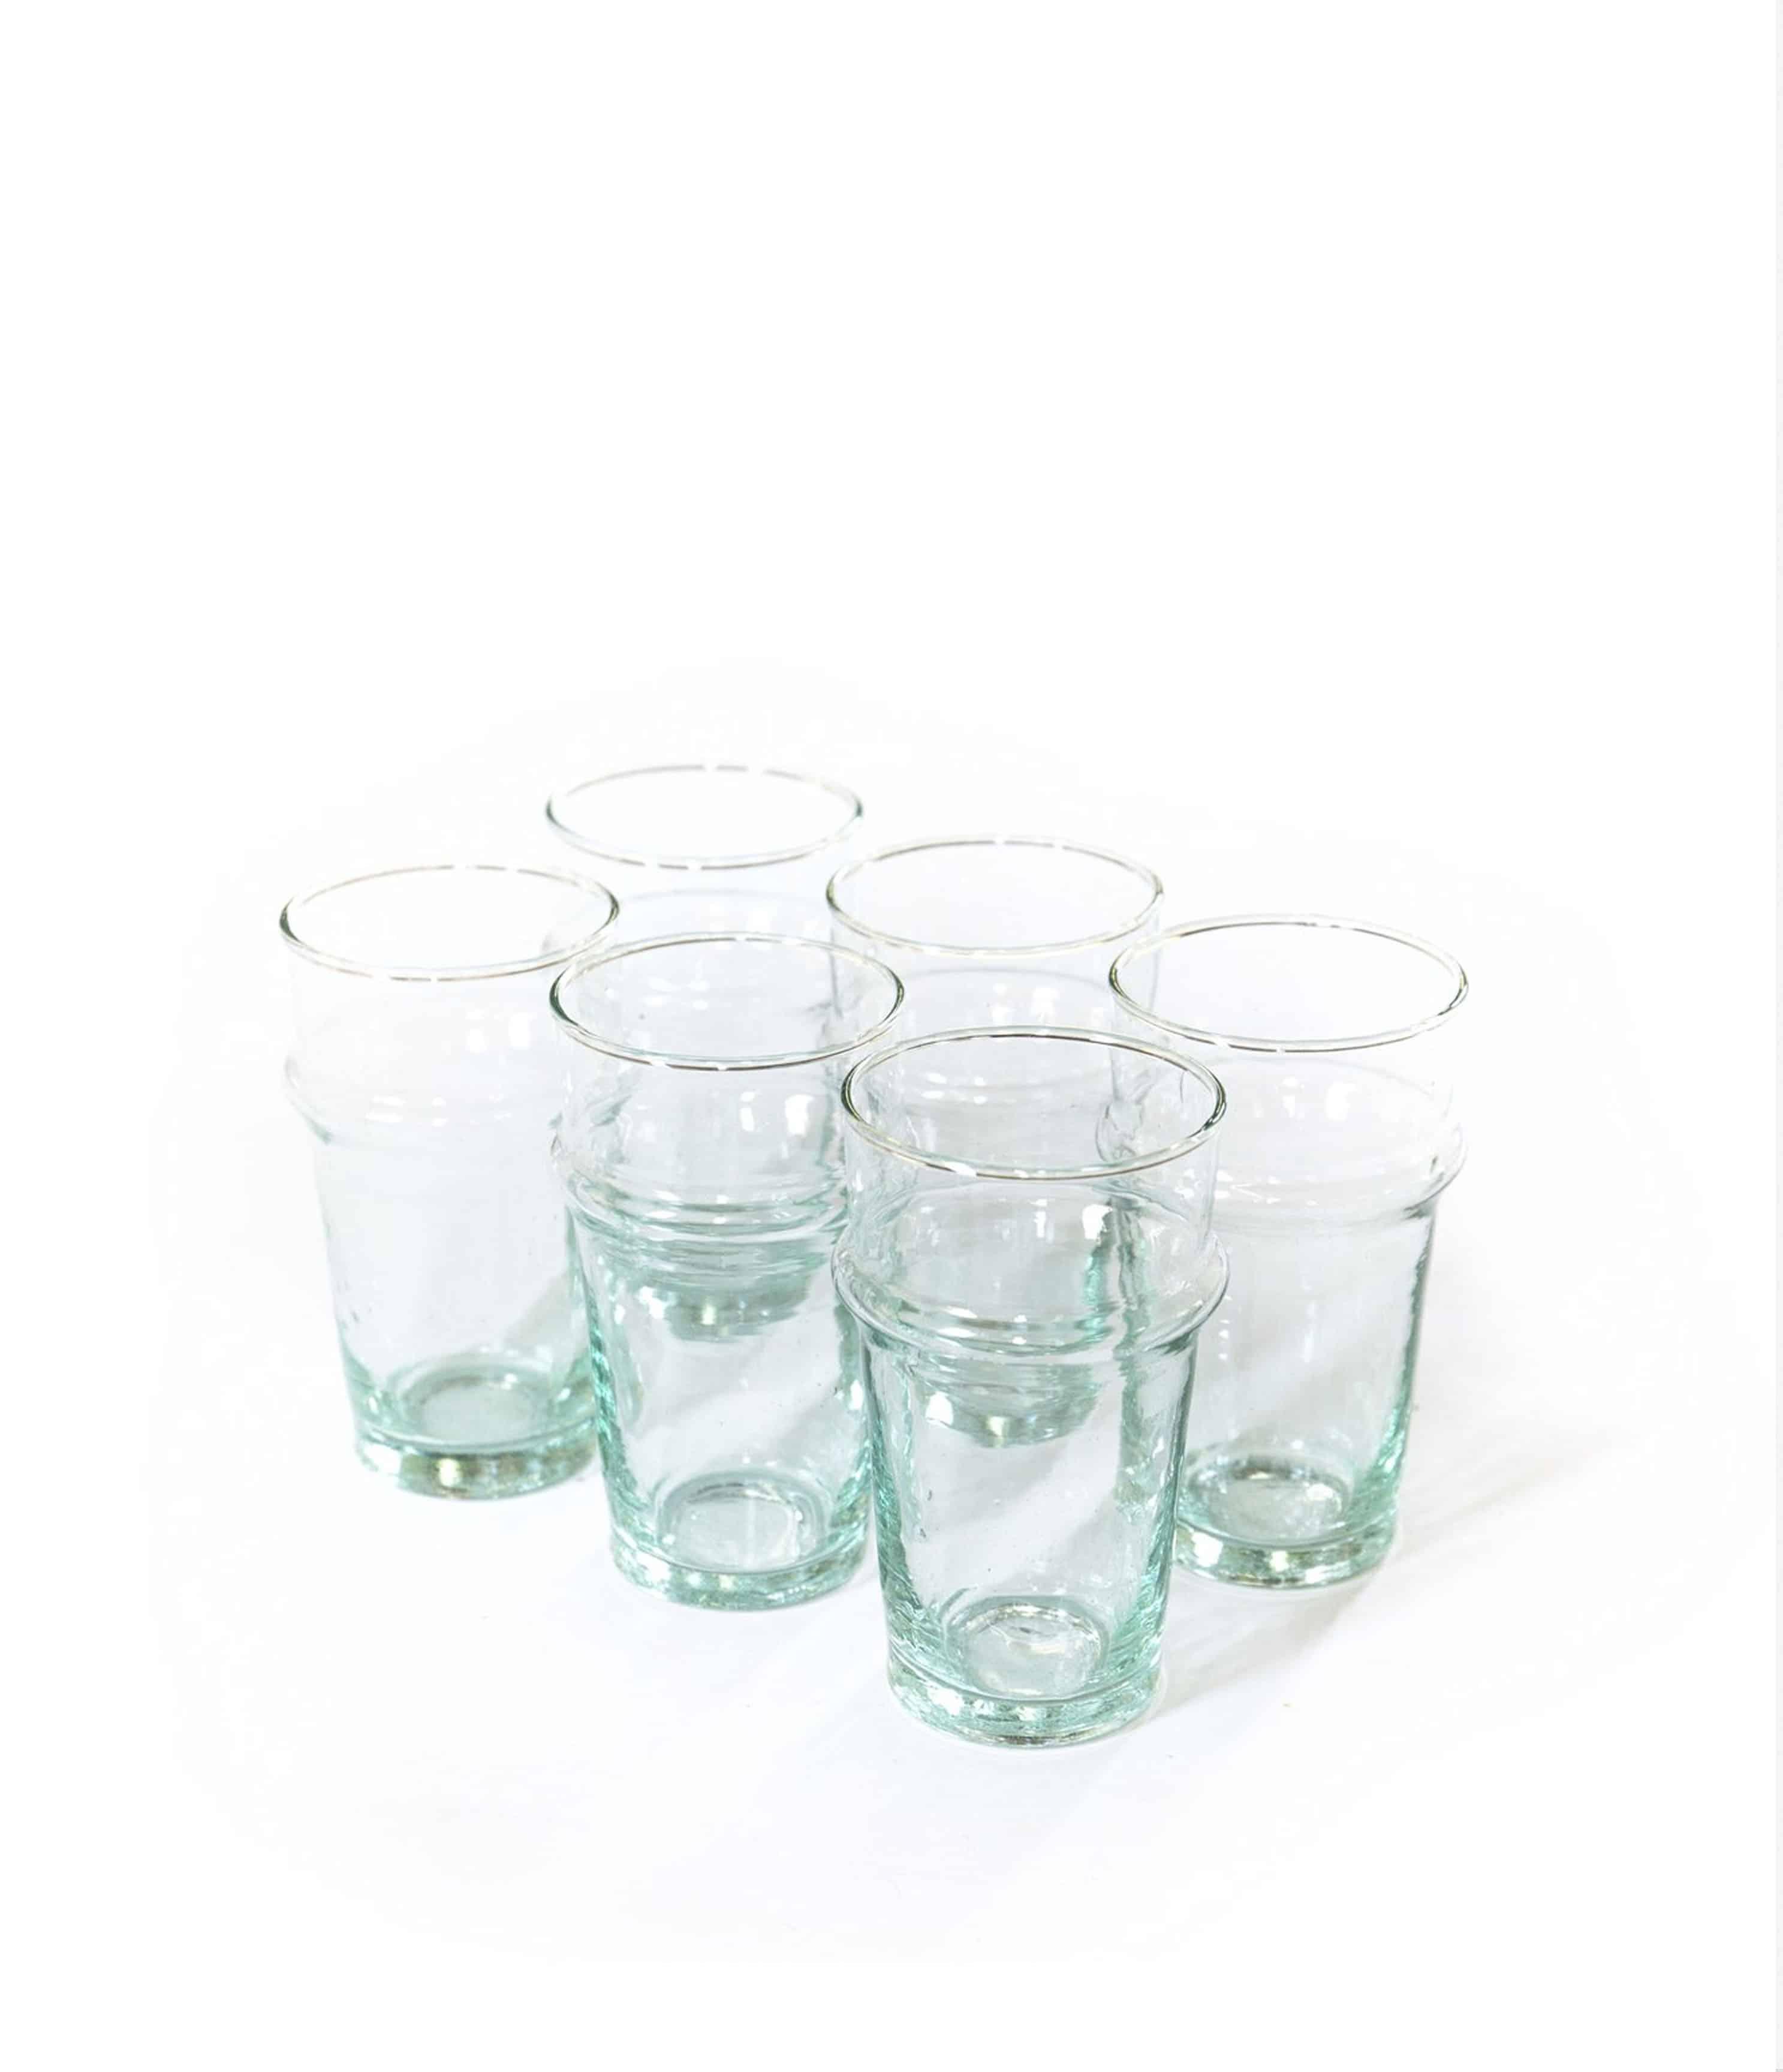 Large Le Verre Beldi Glasses